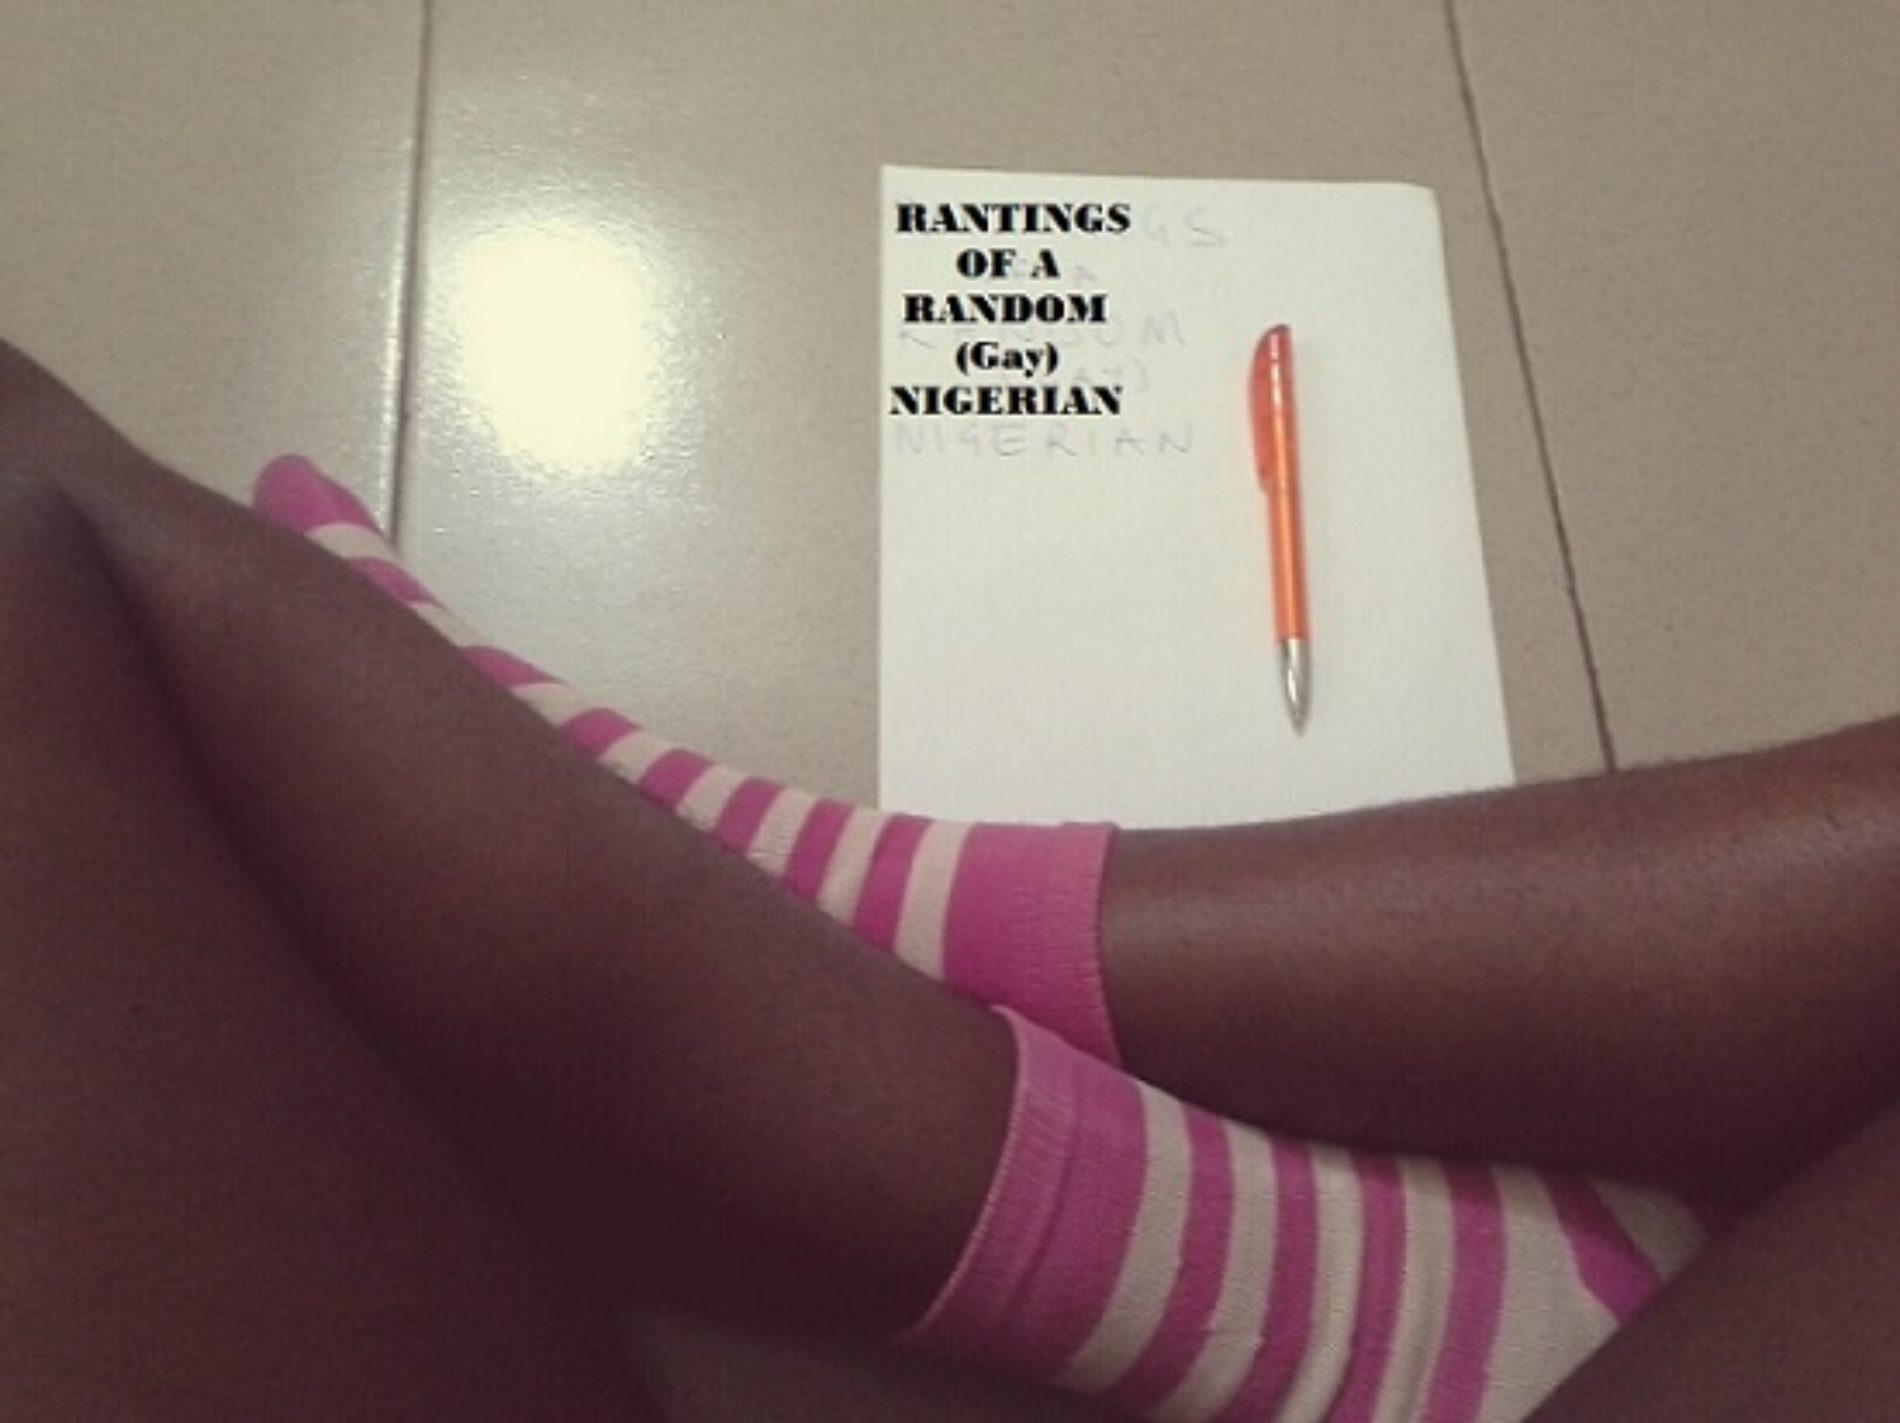 RANTINGS OF A RANDOM (Gay) NIGERIAN (Entry 29)